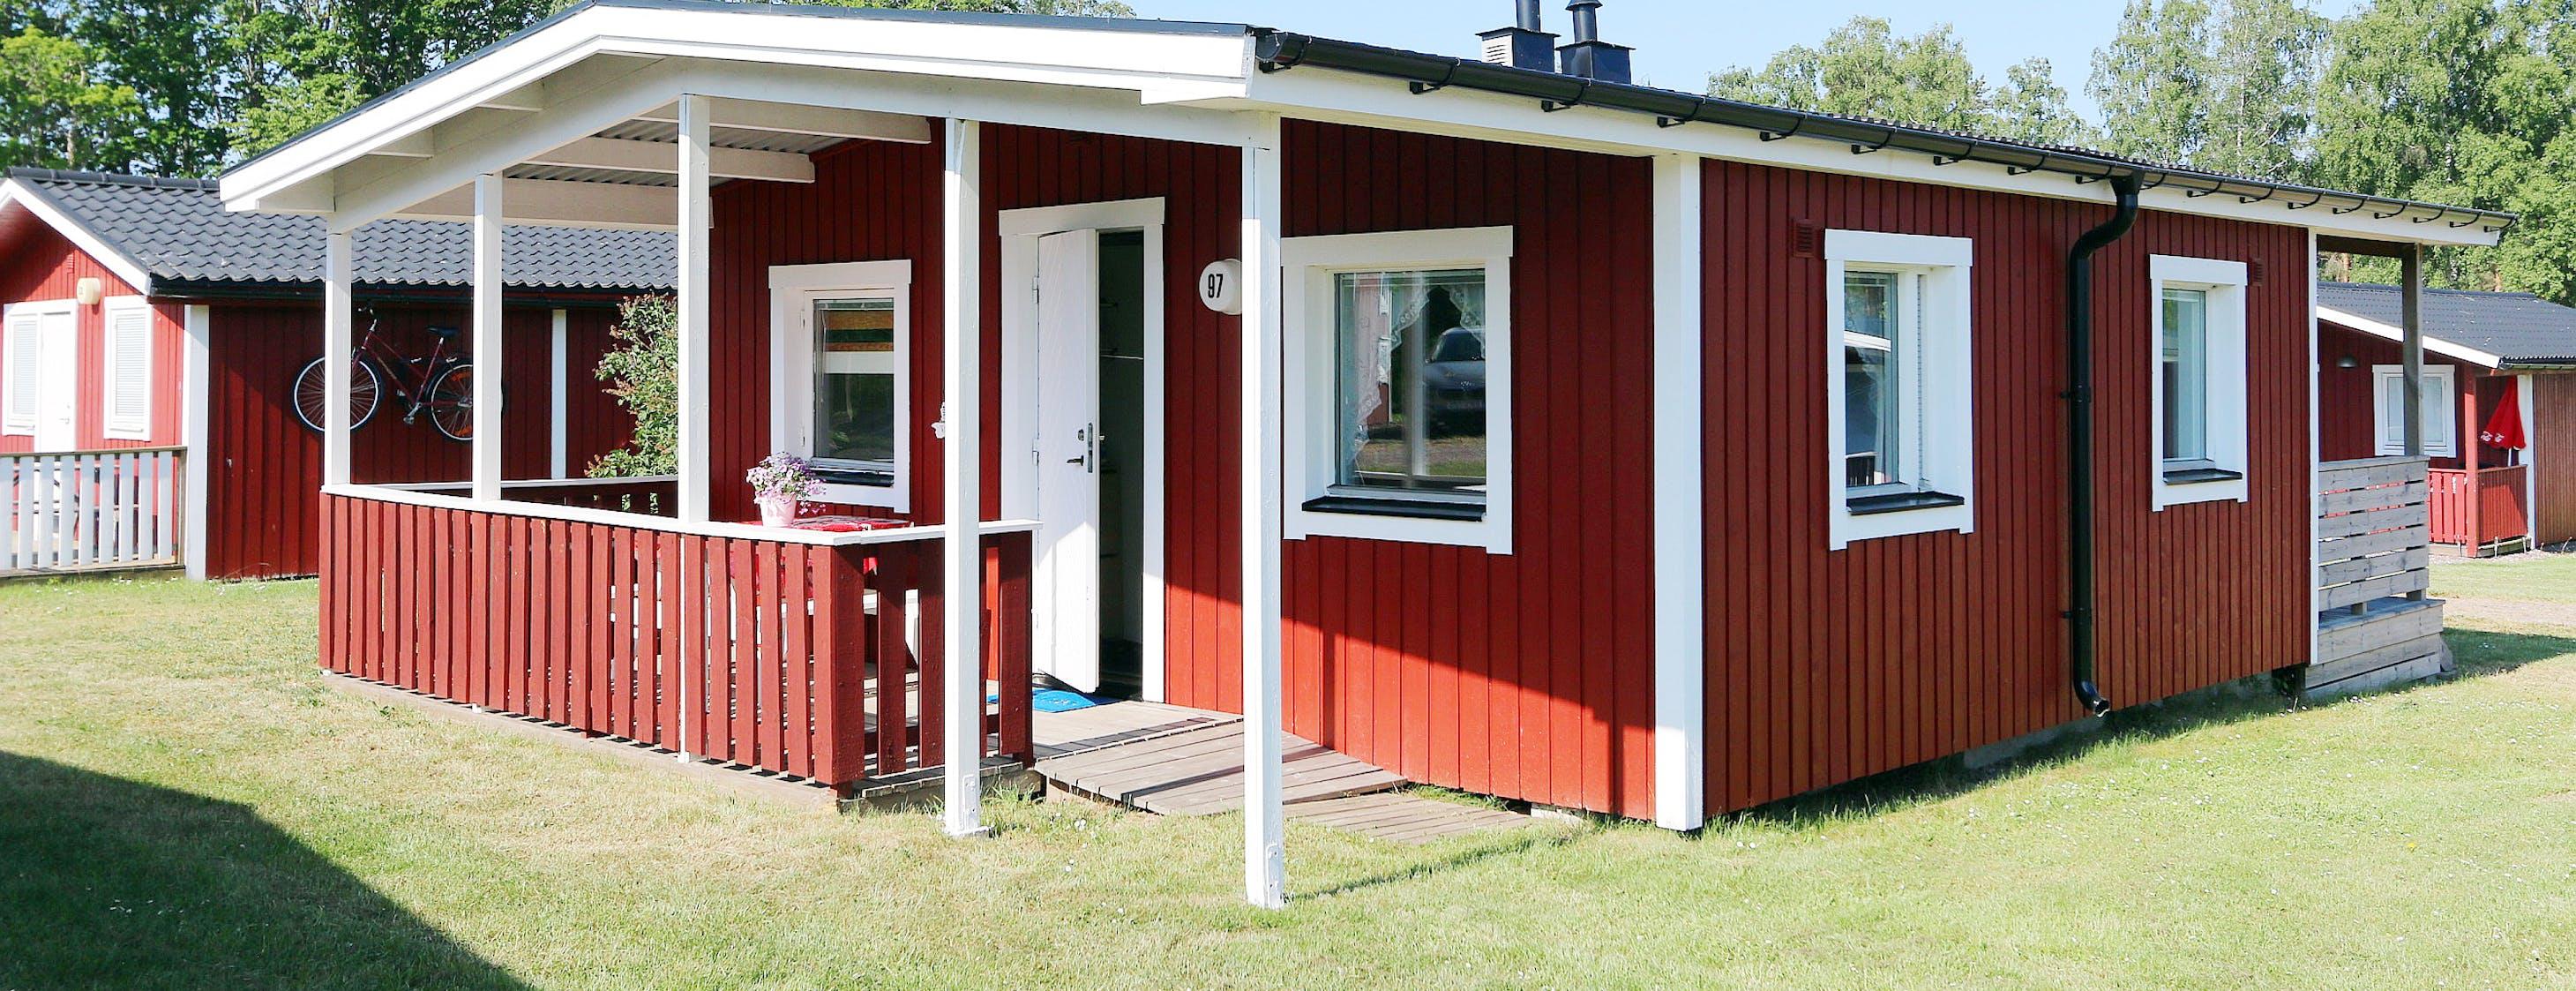 Stuga 97 - Ekerum Camping Ekerum Camping